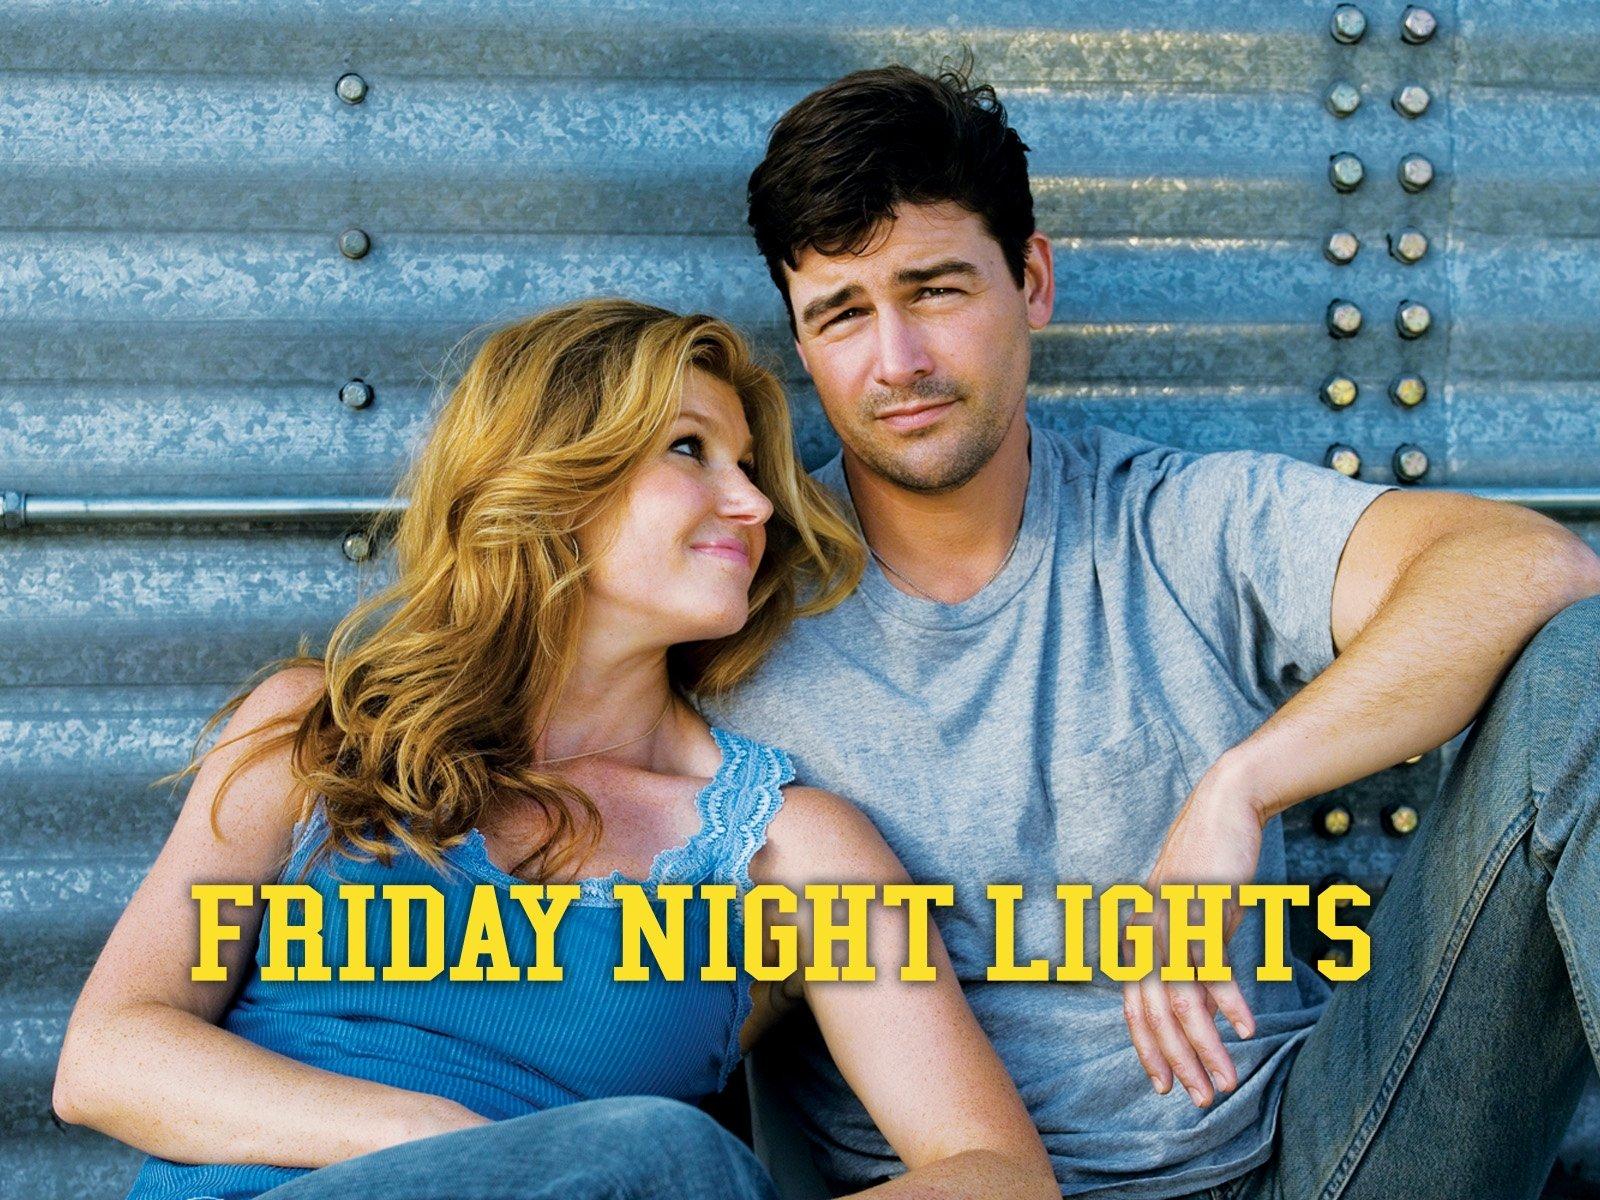 friday night lights movie free download